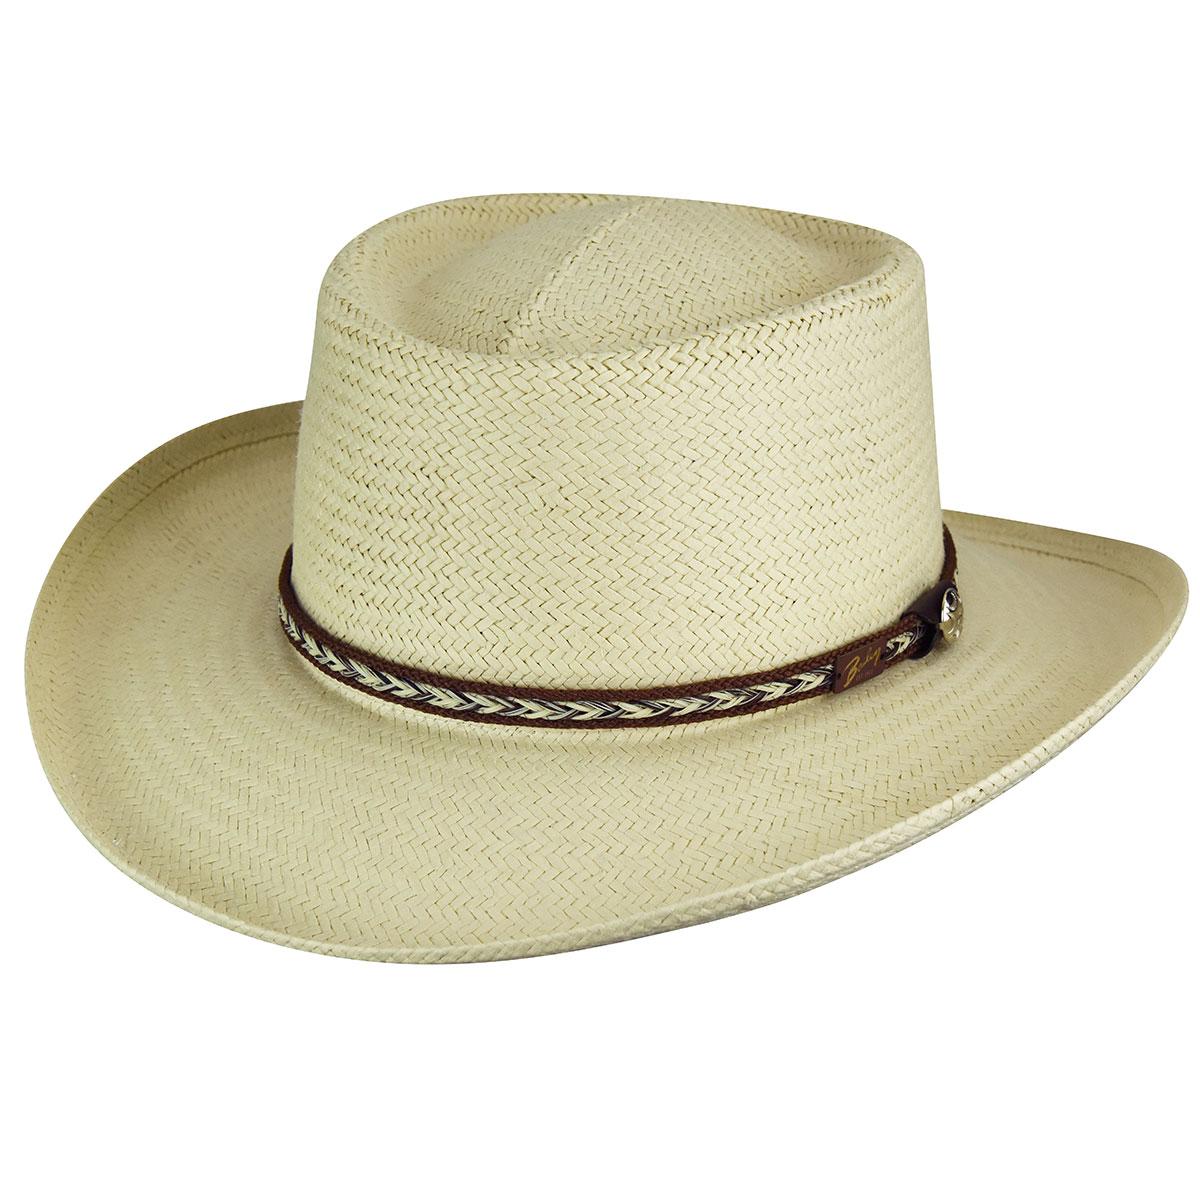 Steampunk Hats for Men | Top Hat, Bowler, Masks Rockett RainduraGambler - TanS $110.00 AT vintagedancer.com